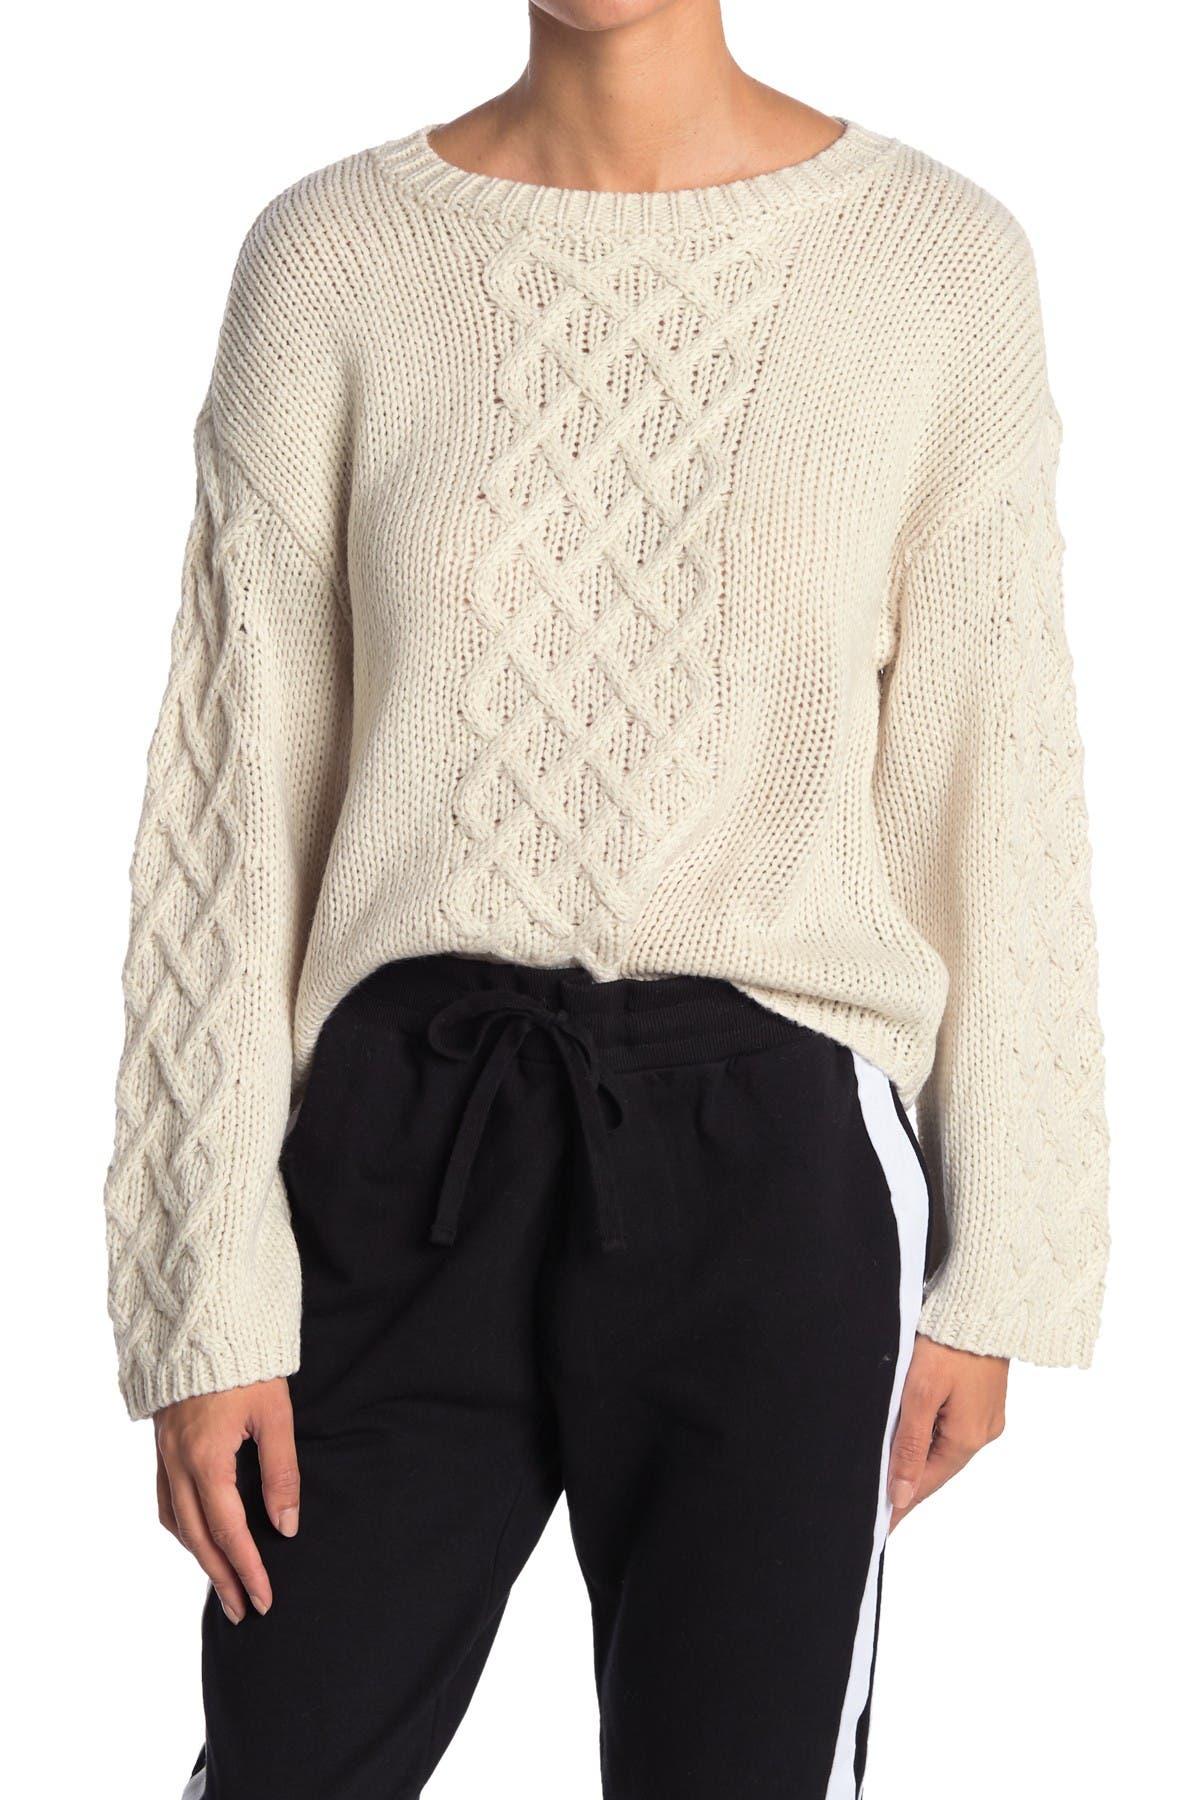 Image of BB Dakota Retro Active Sweater